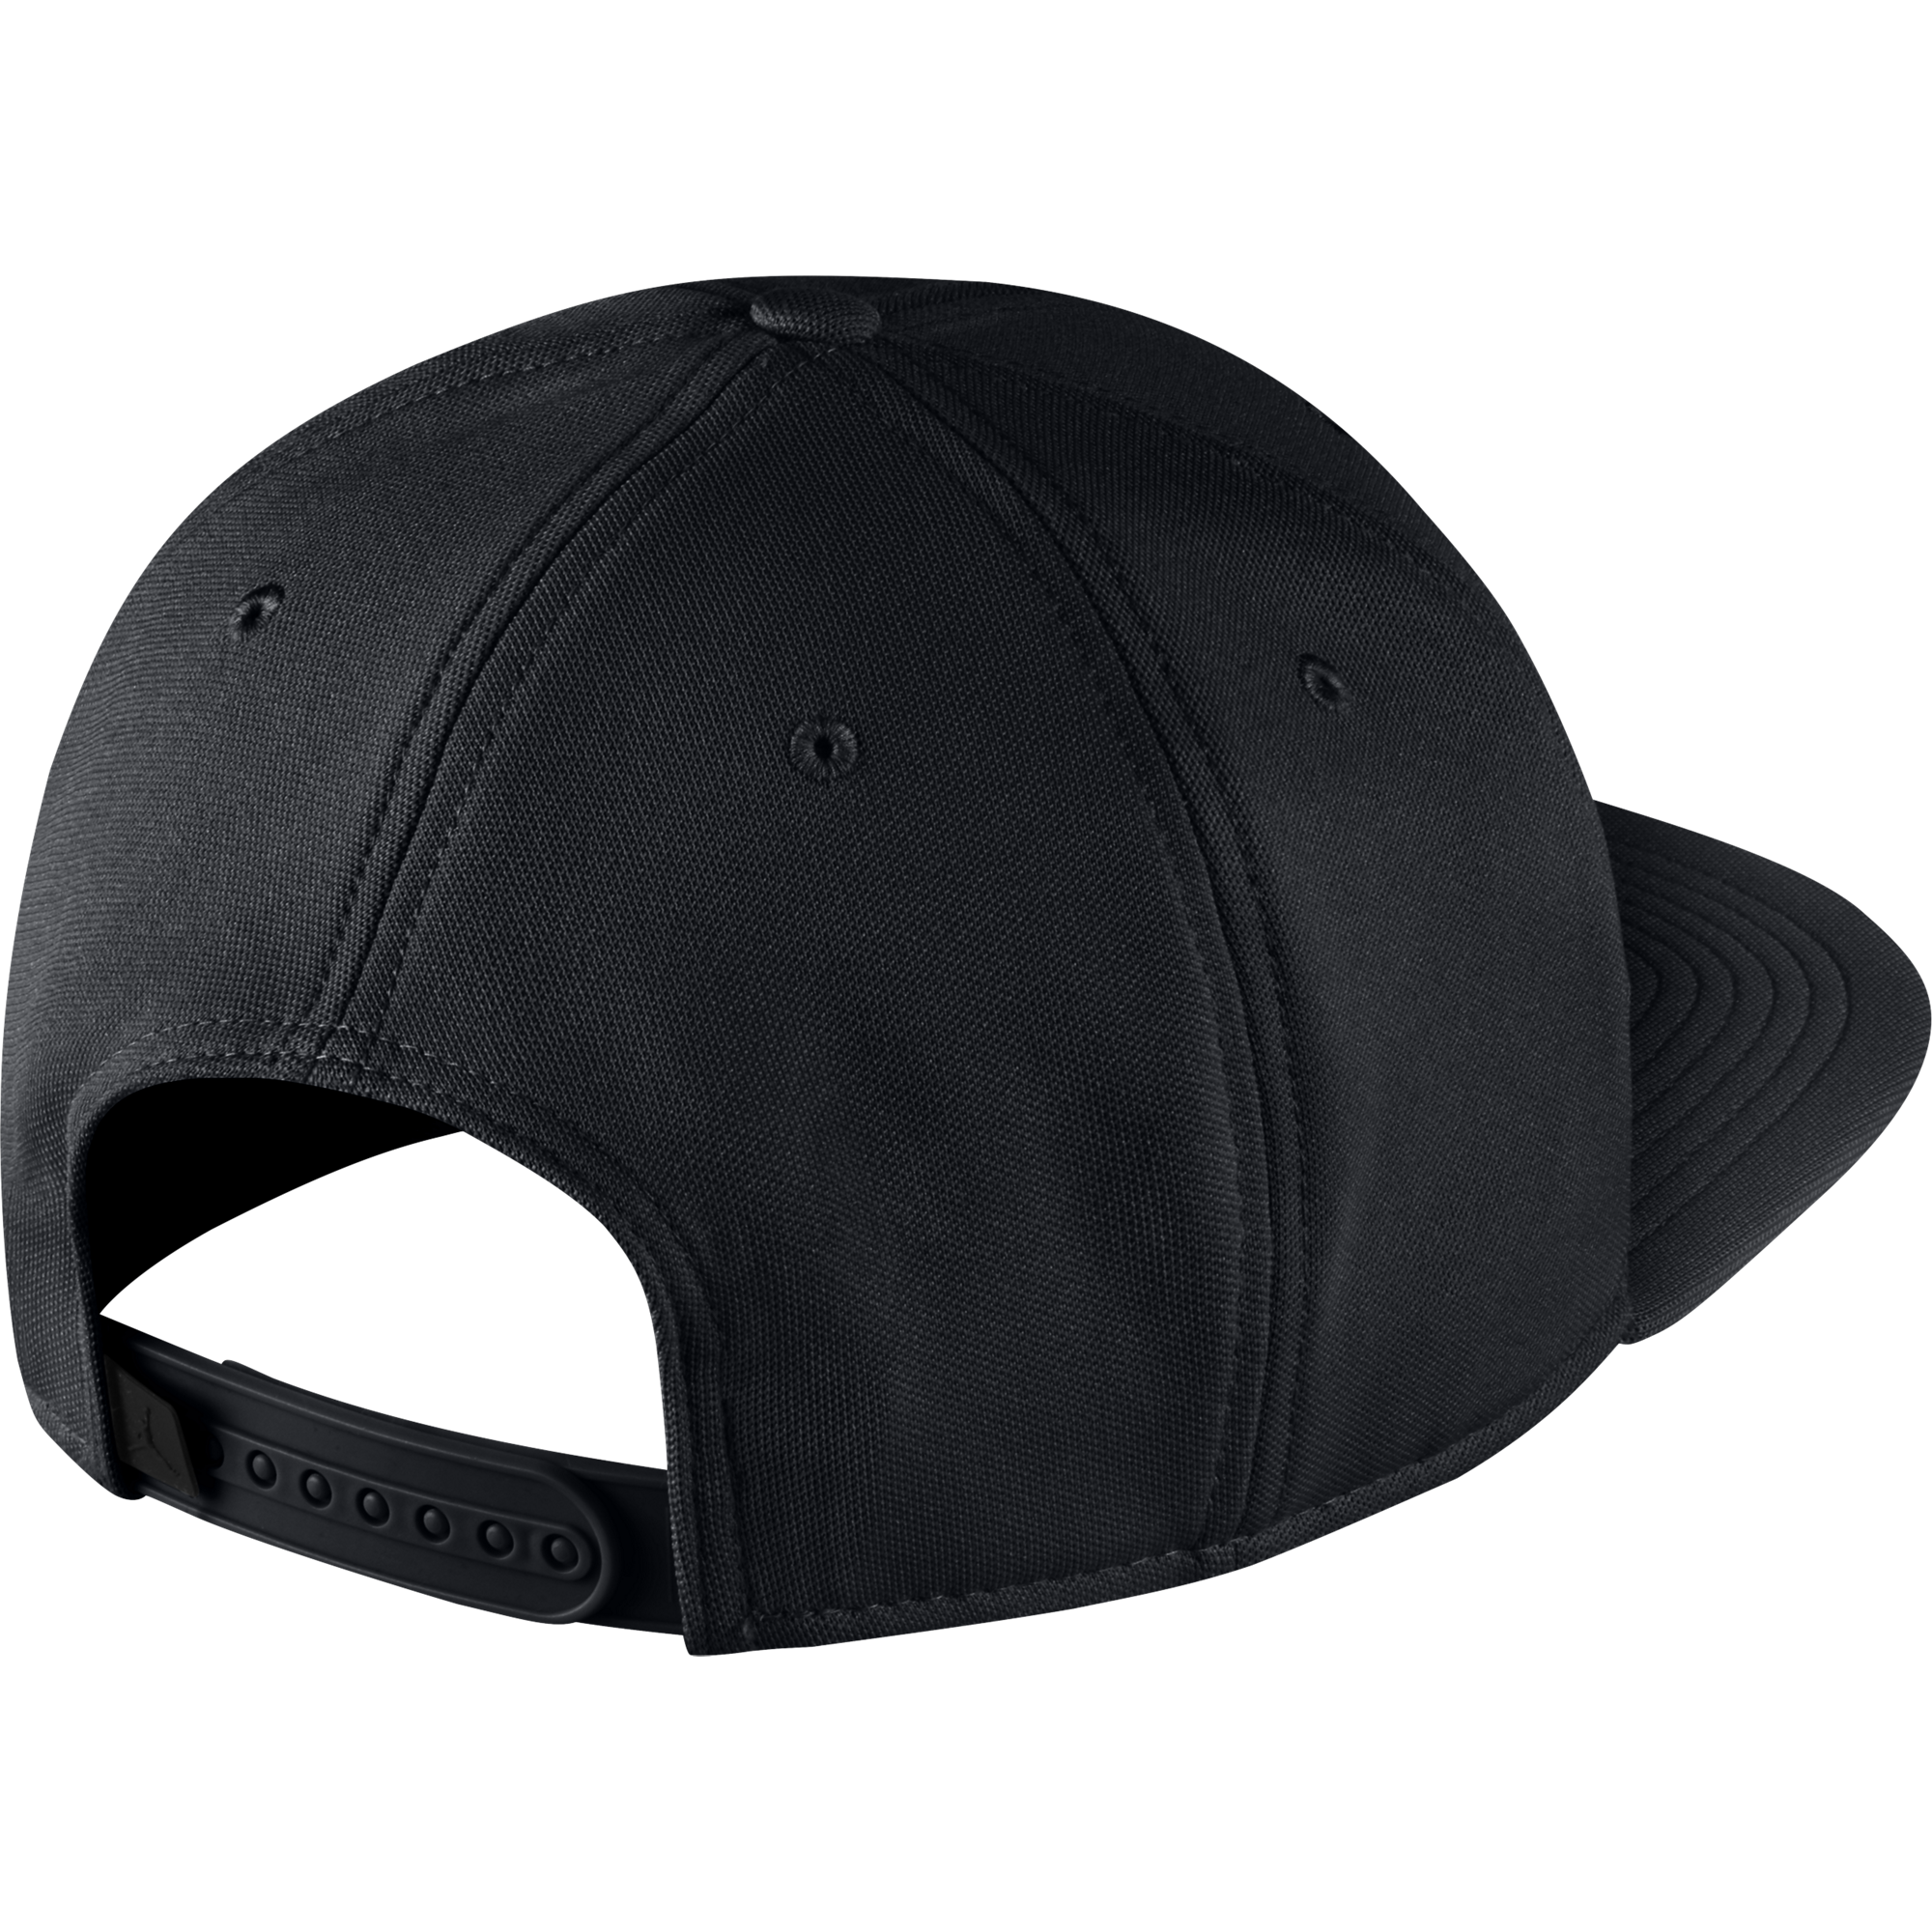 ef363351 ... promo code for nike air jordan jumpman snapback hat. previous next  dd64a 7047f ...